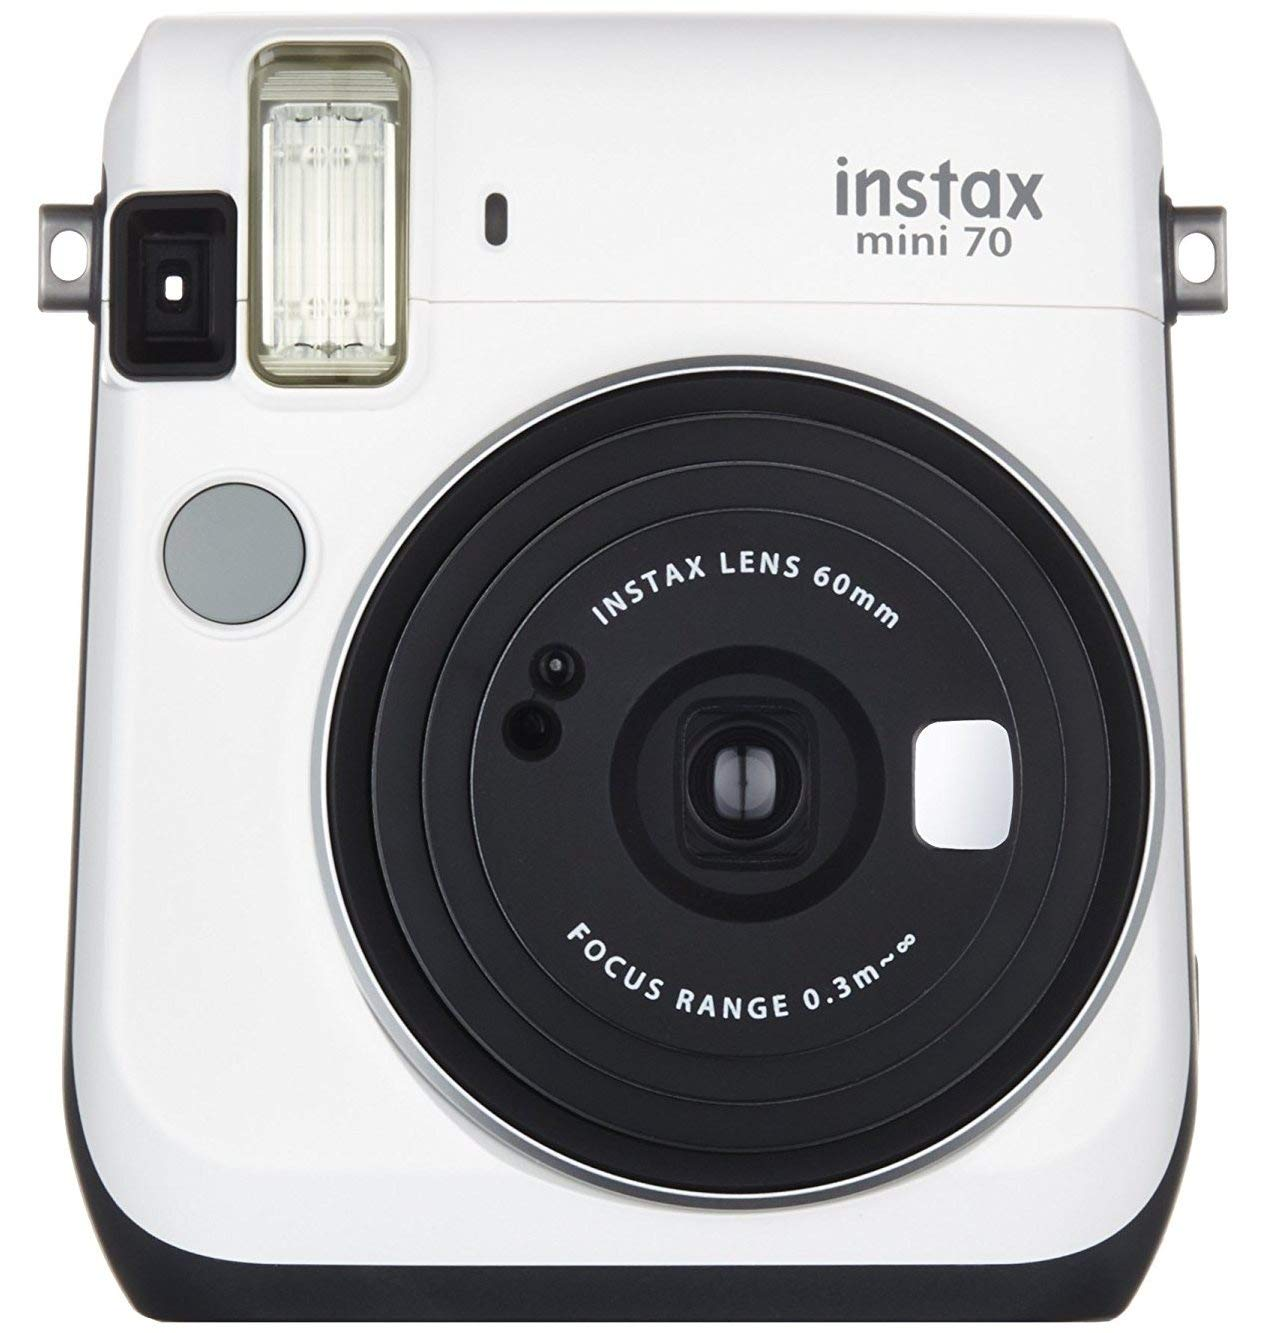 d5ce880b39f872 Fujifilm Instax Mini 70 Appareil photo instantané Blanc  Amazon.fr  Photo    Caméscopes